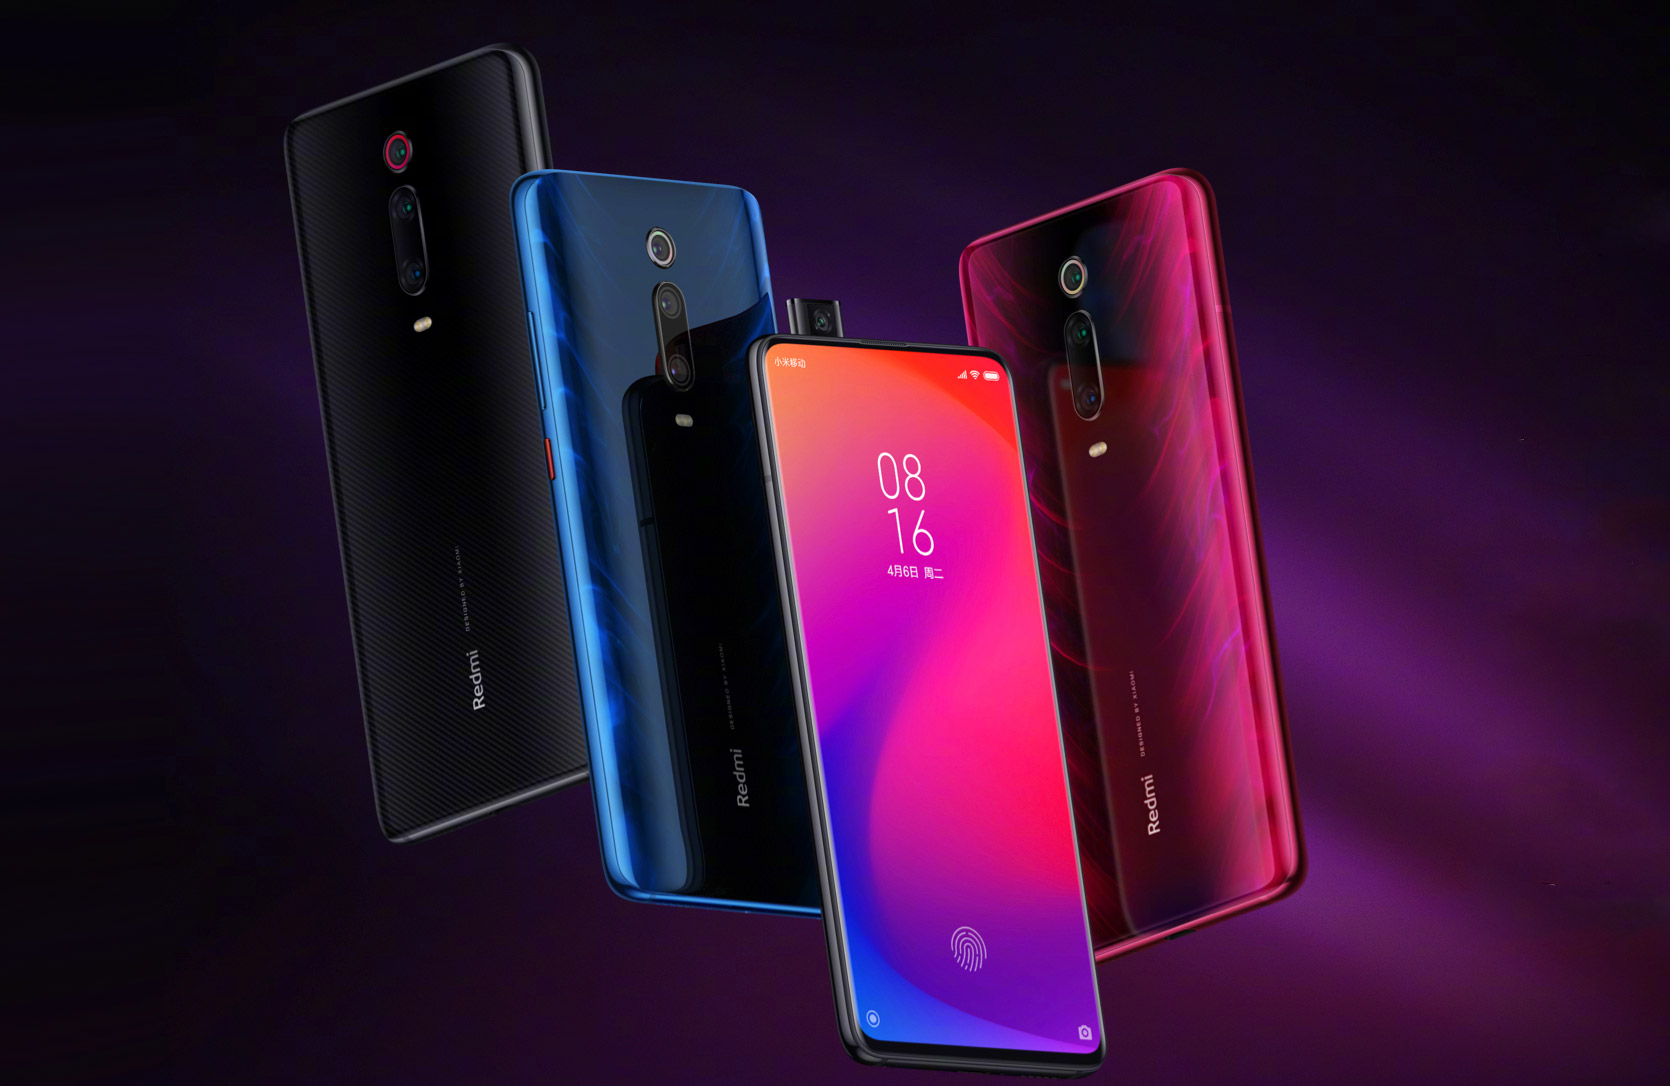 Xiaomi Redmi K30: Design revealed ahead of imminent launch